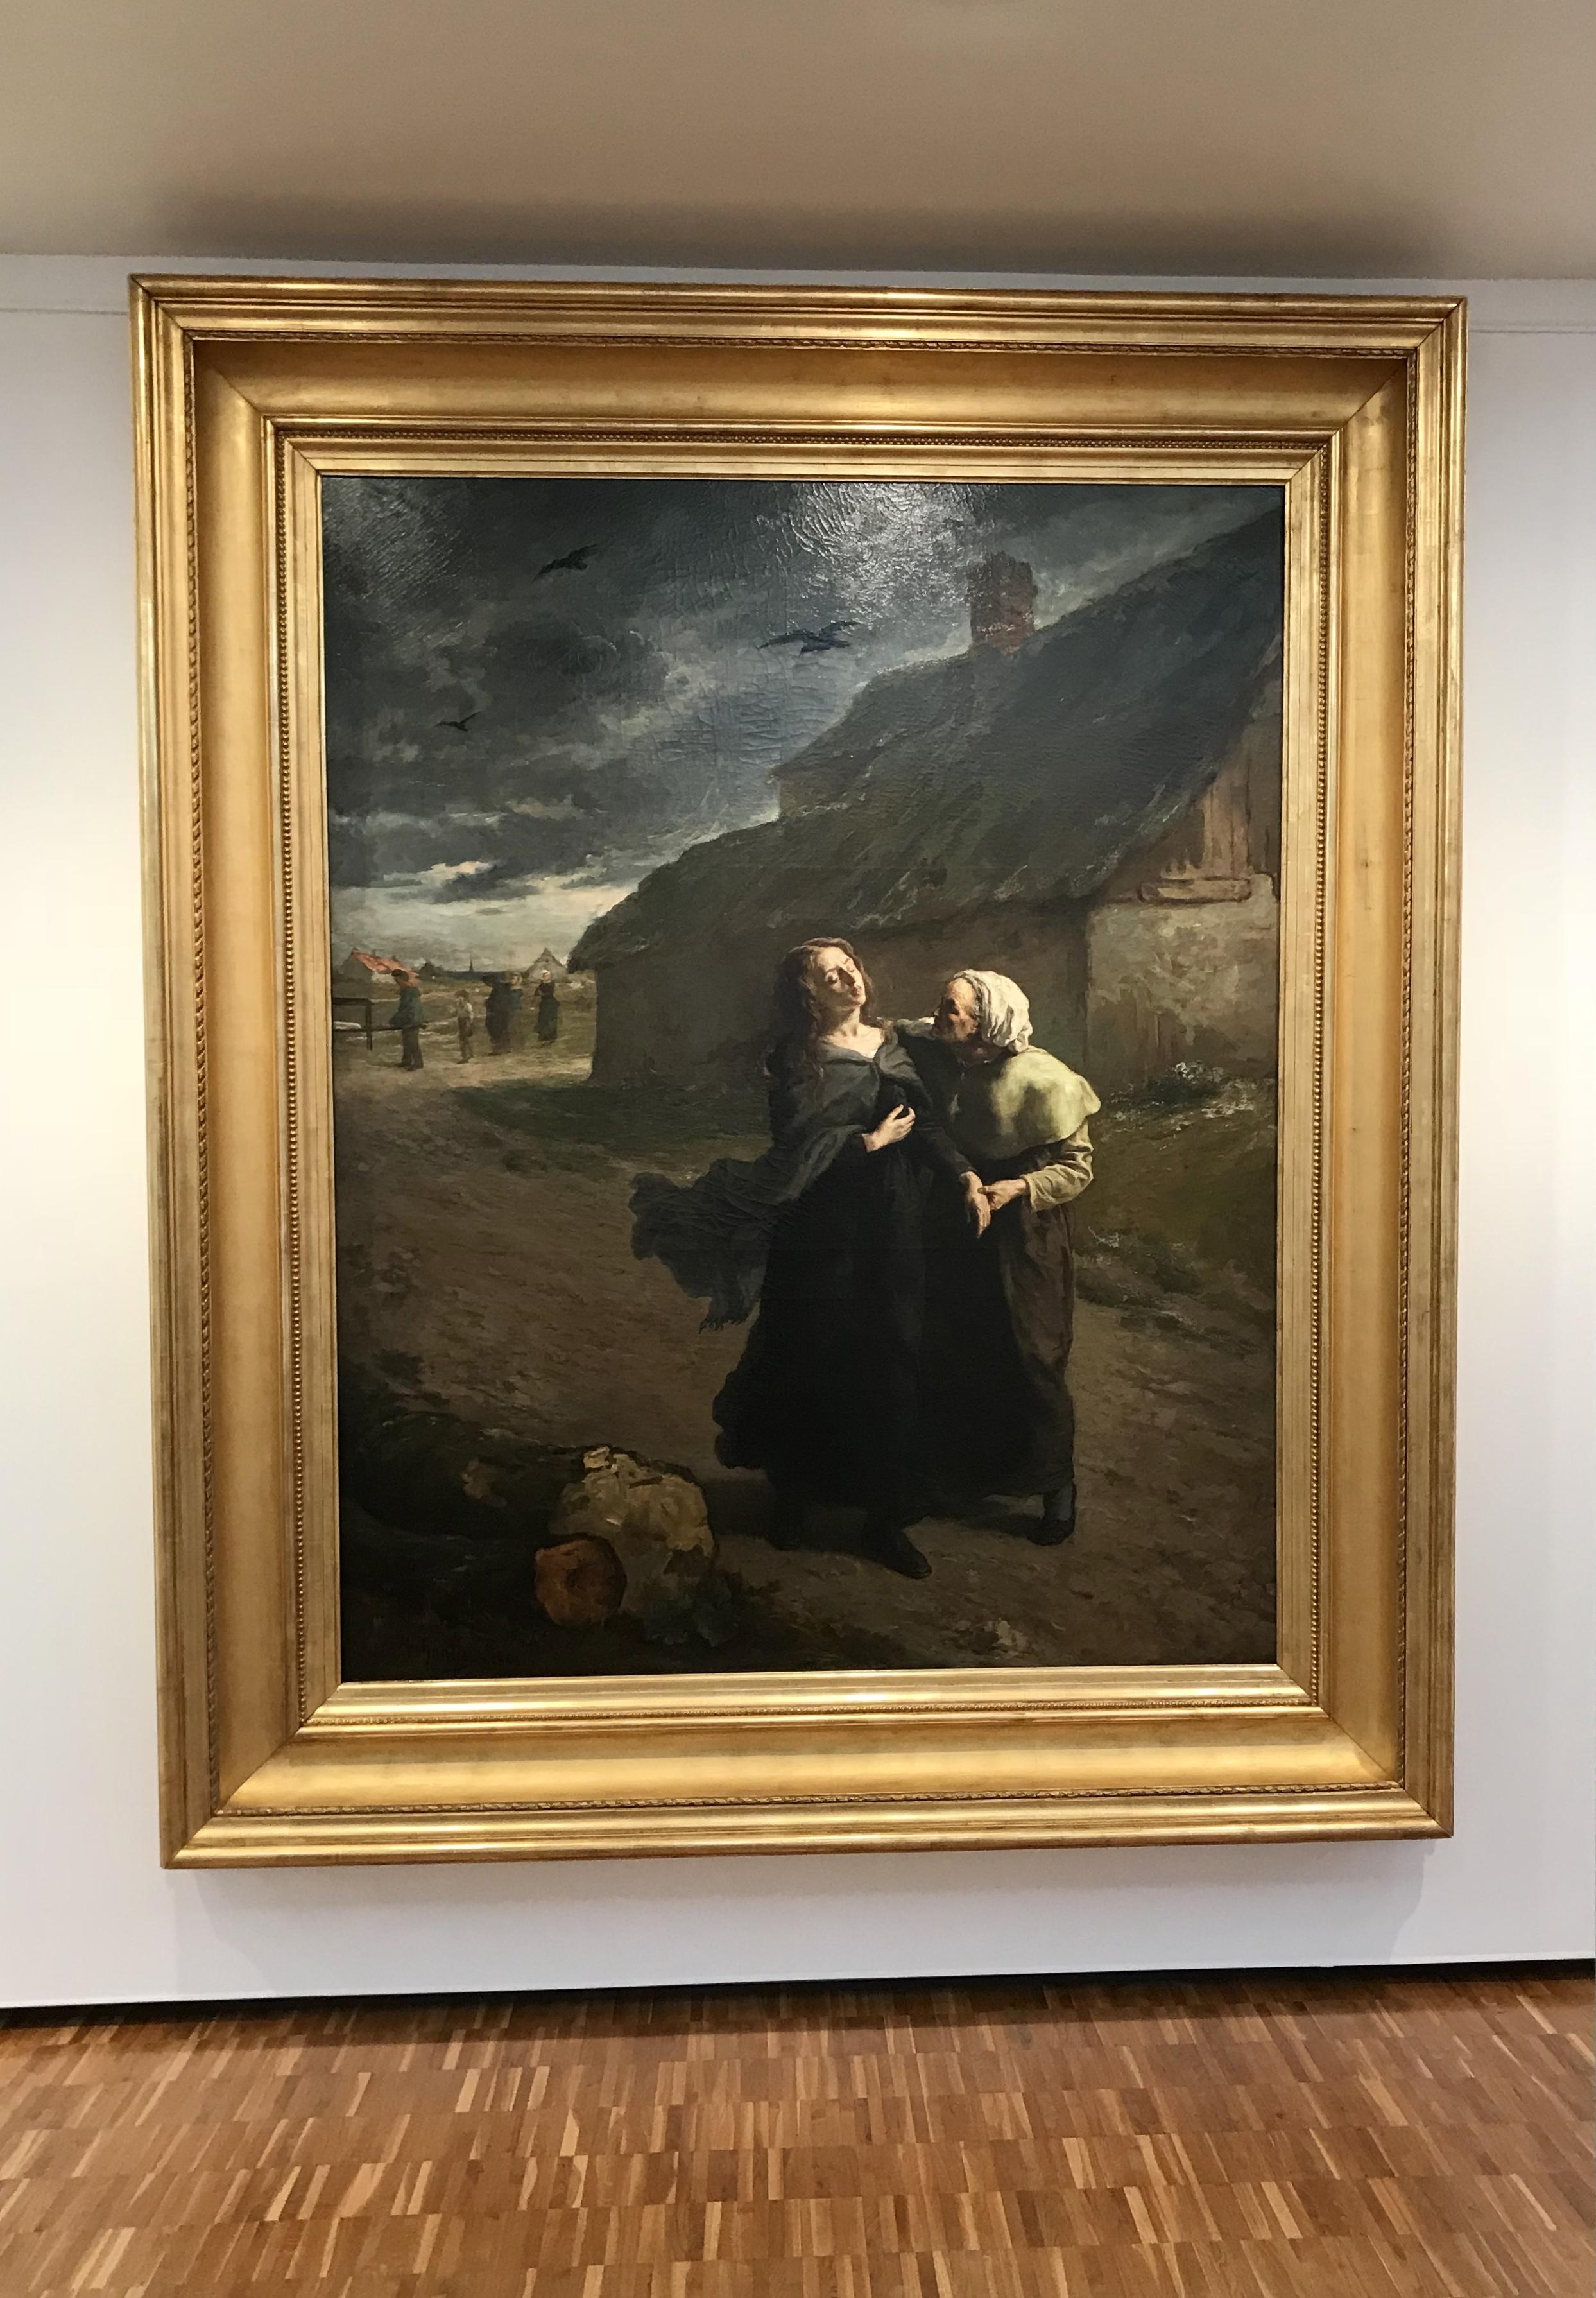 TRAVAIL AU MUSEE BERNARD D'AGESCI